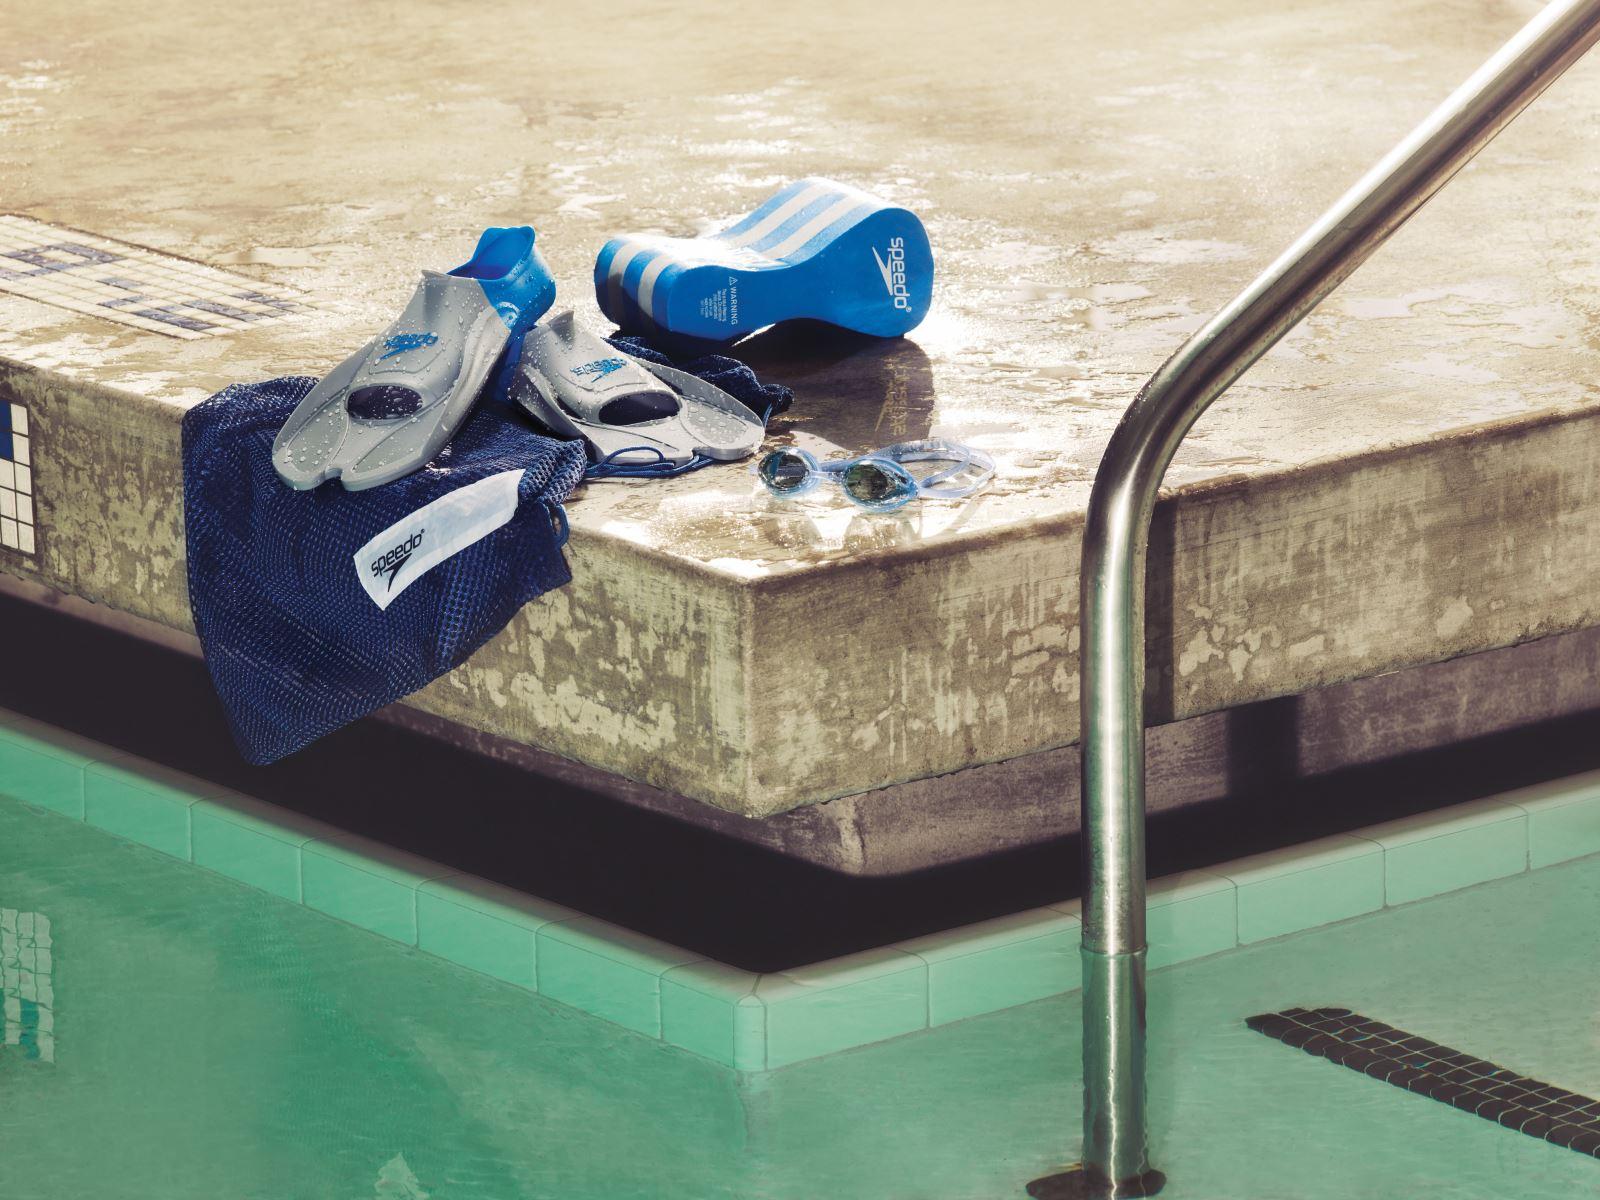 How to Put on Swim Fins